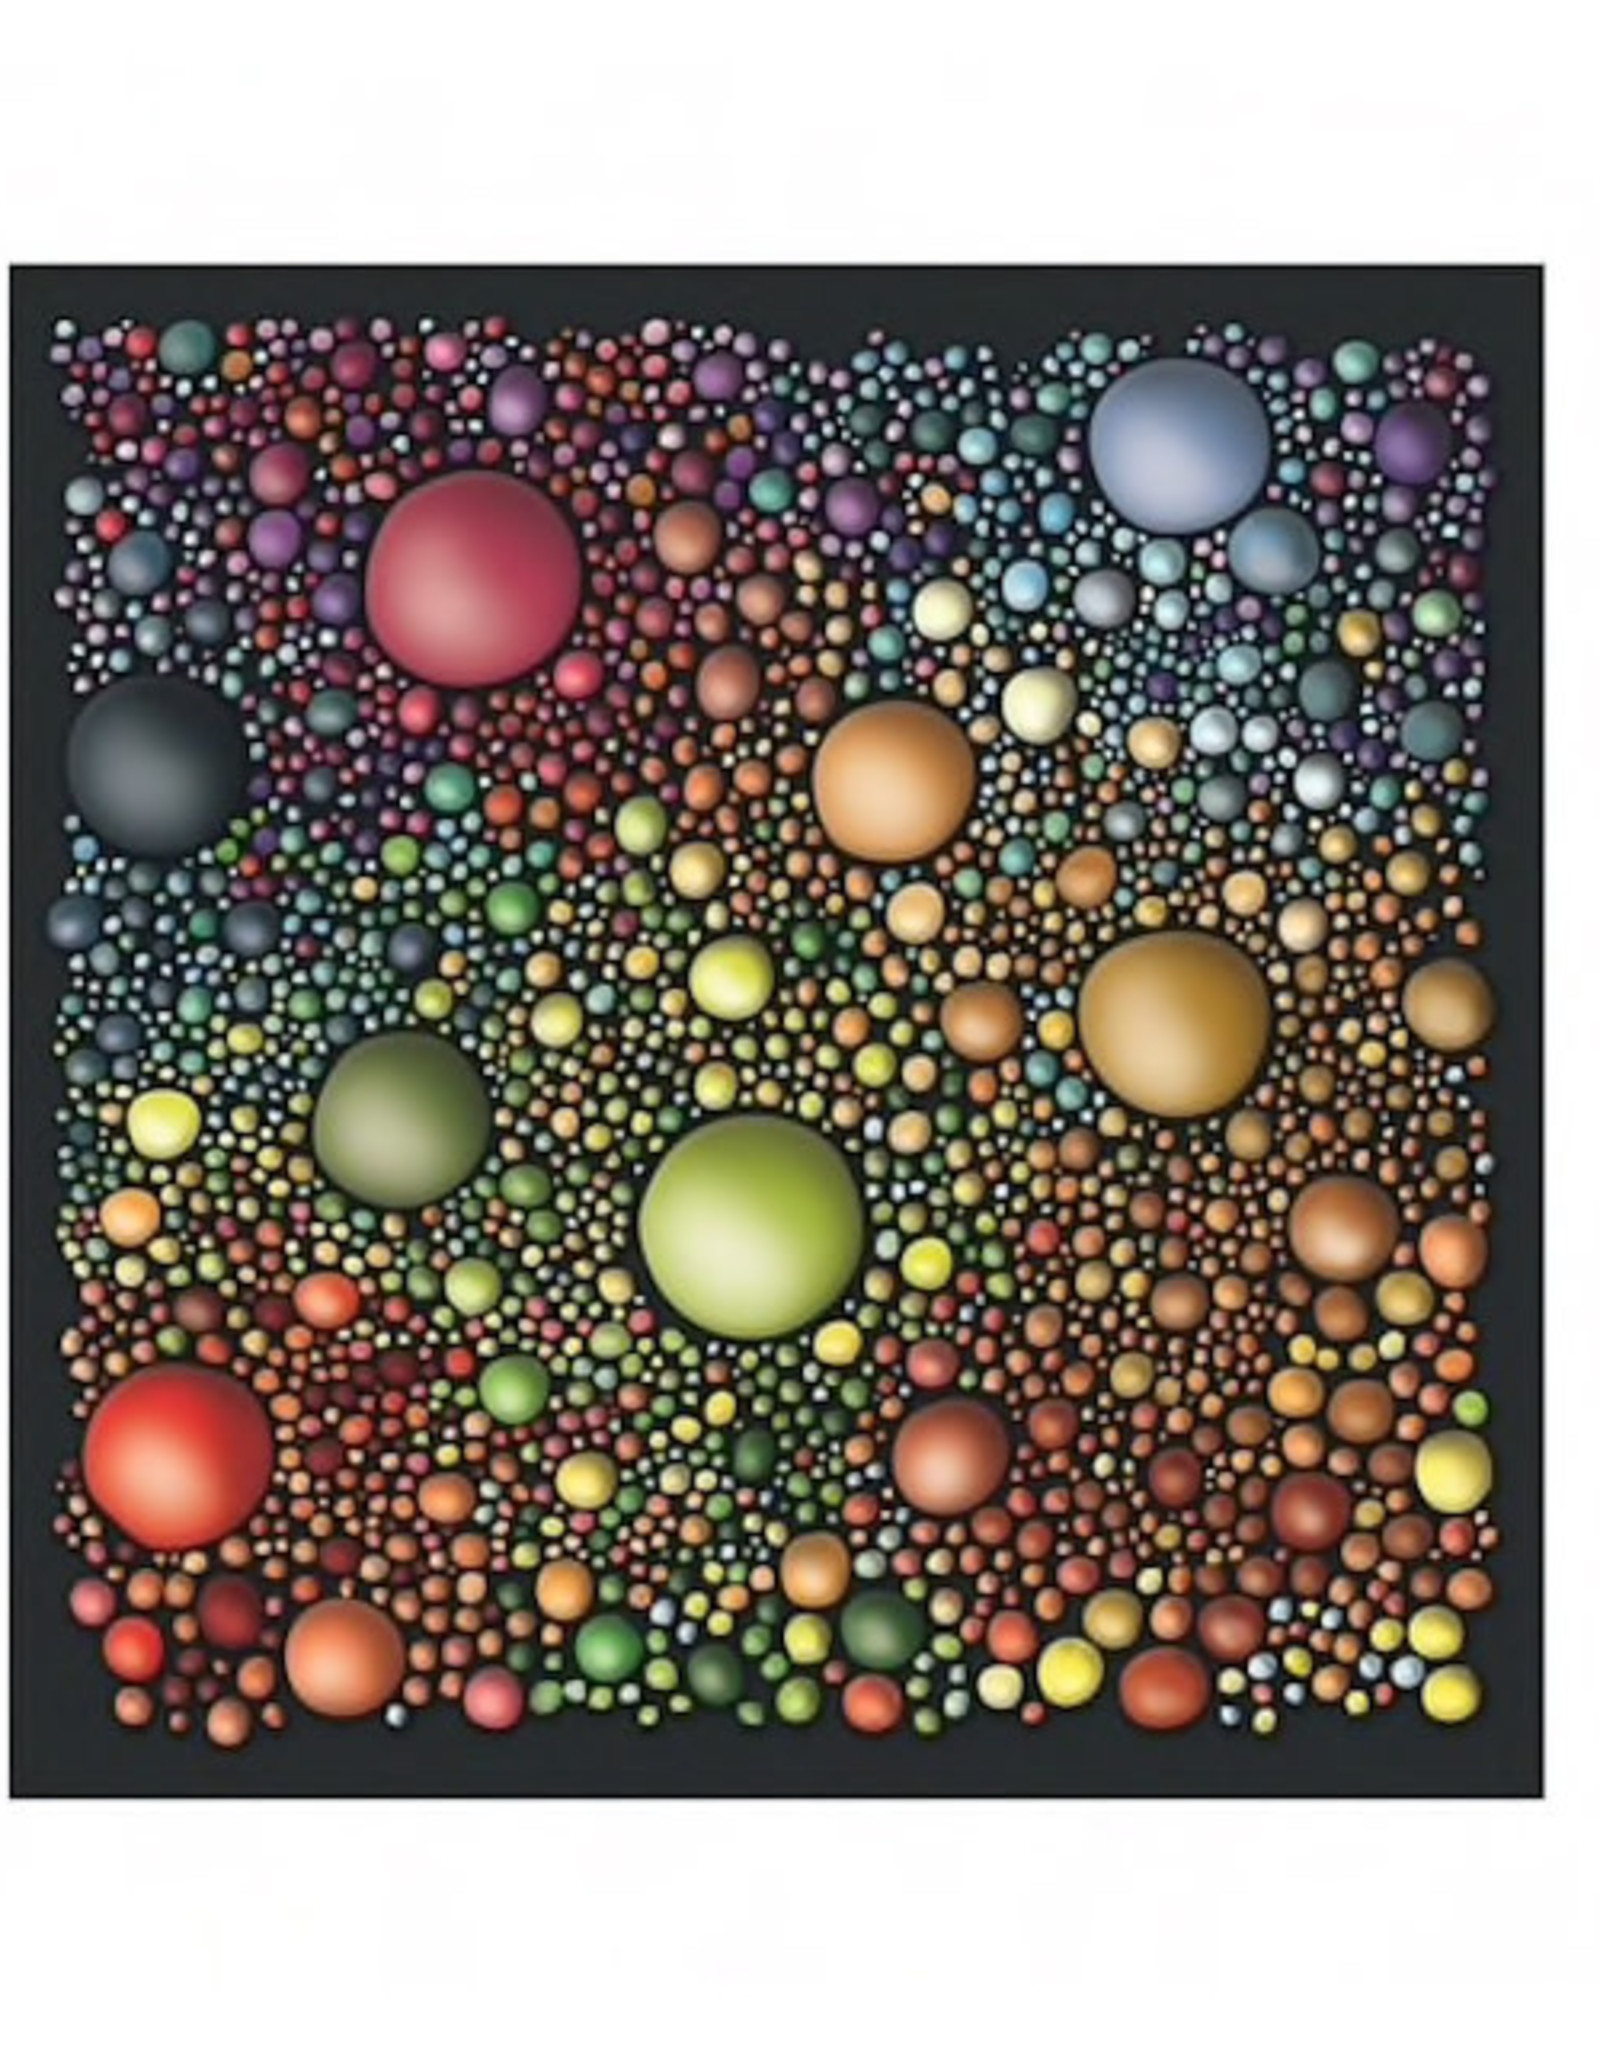 HQ Kites Palapeli Puzzle-Stardust